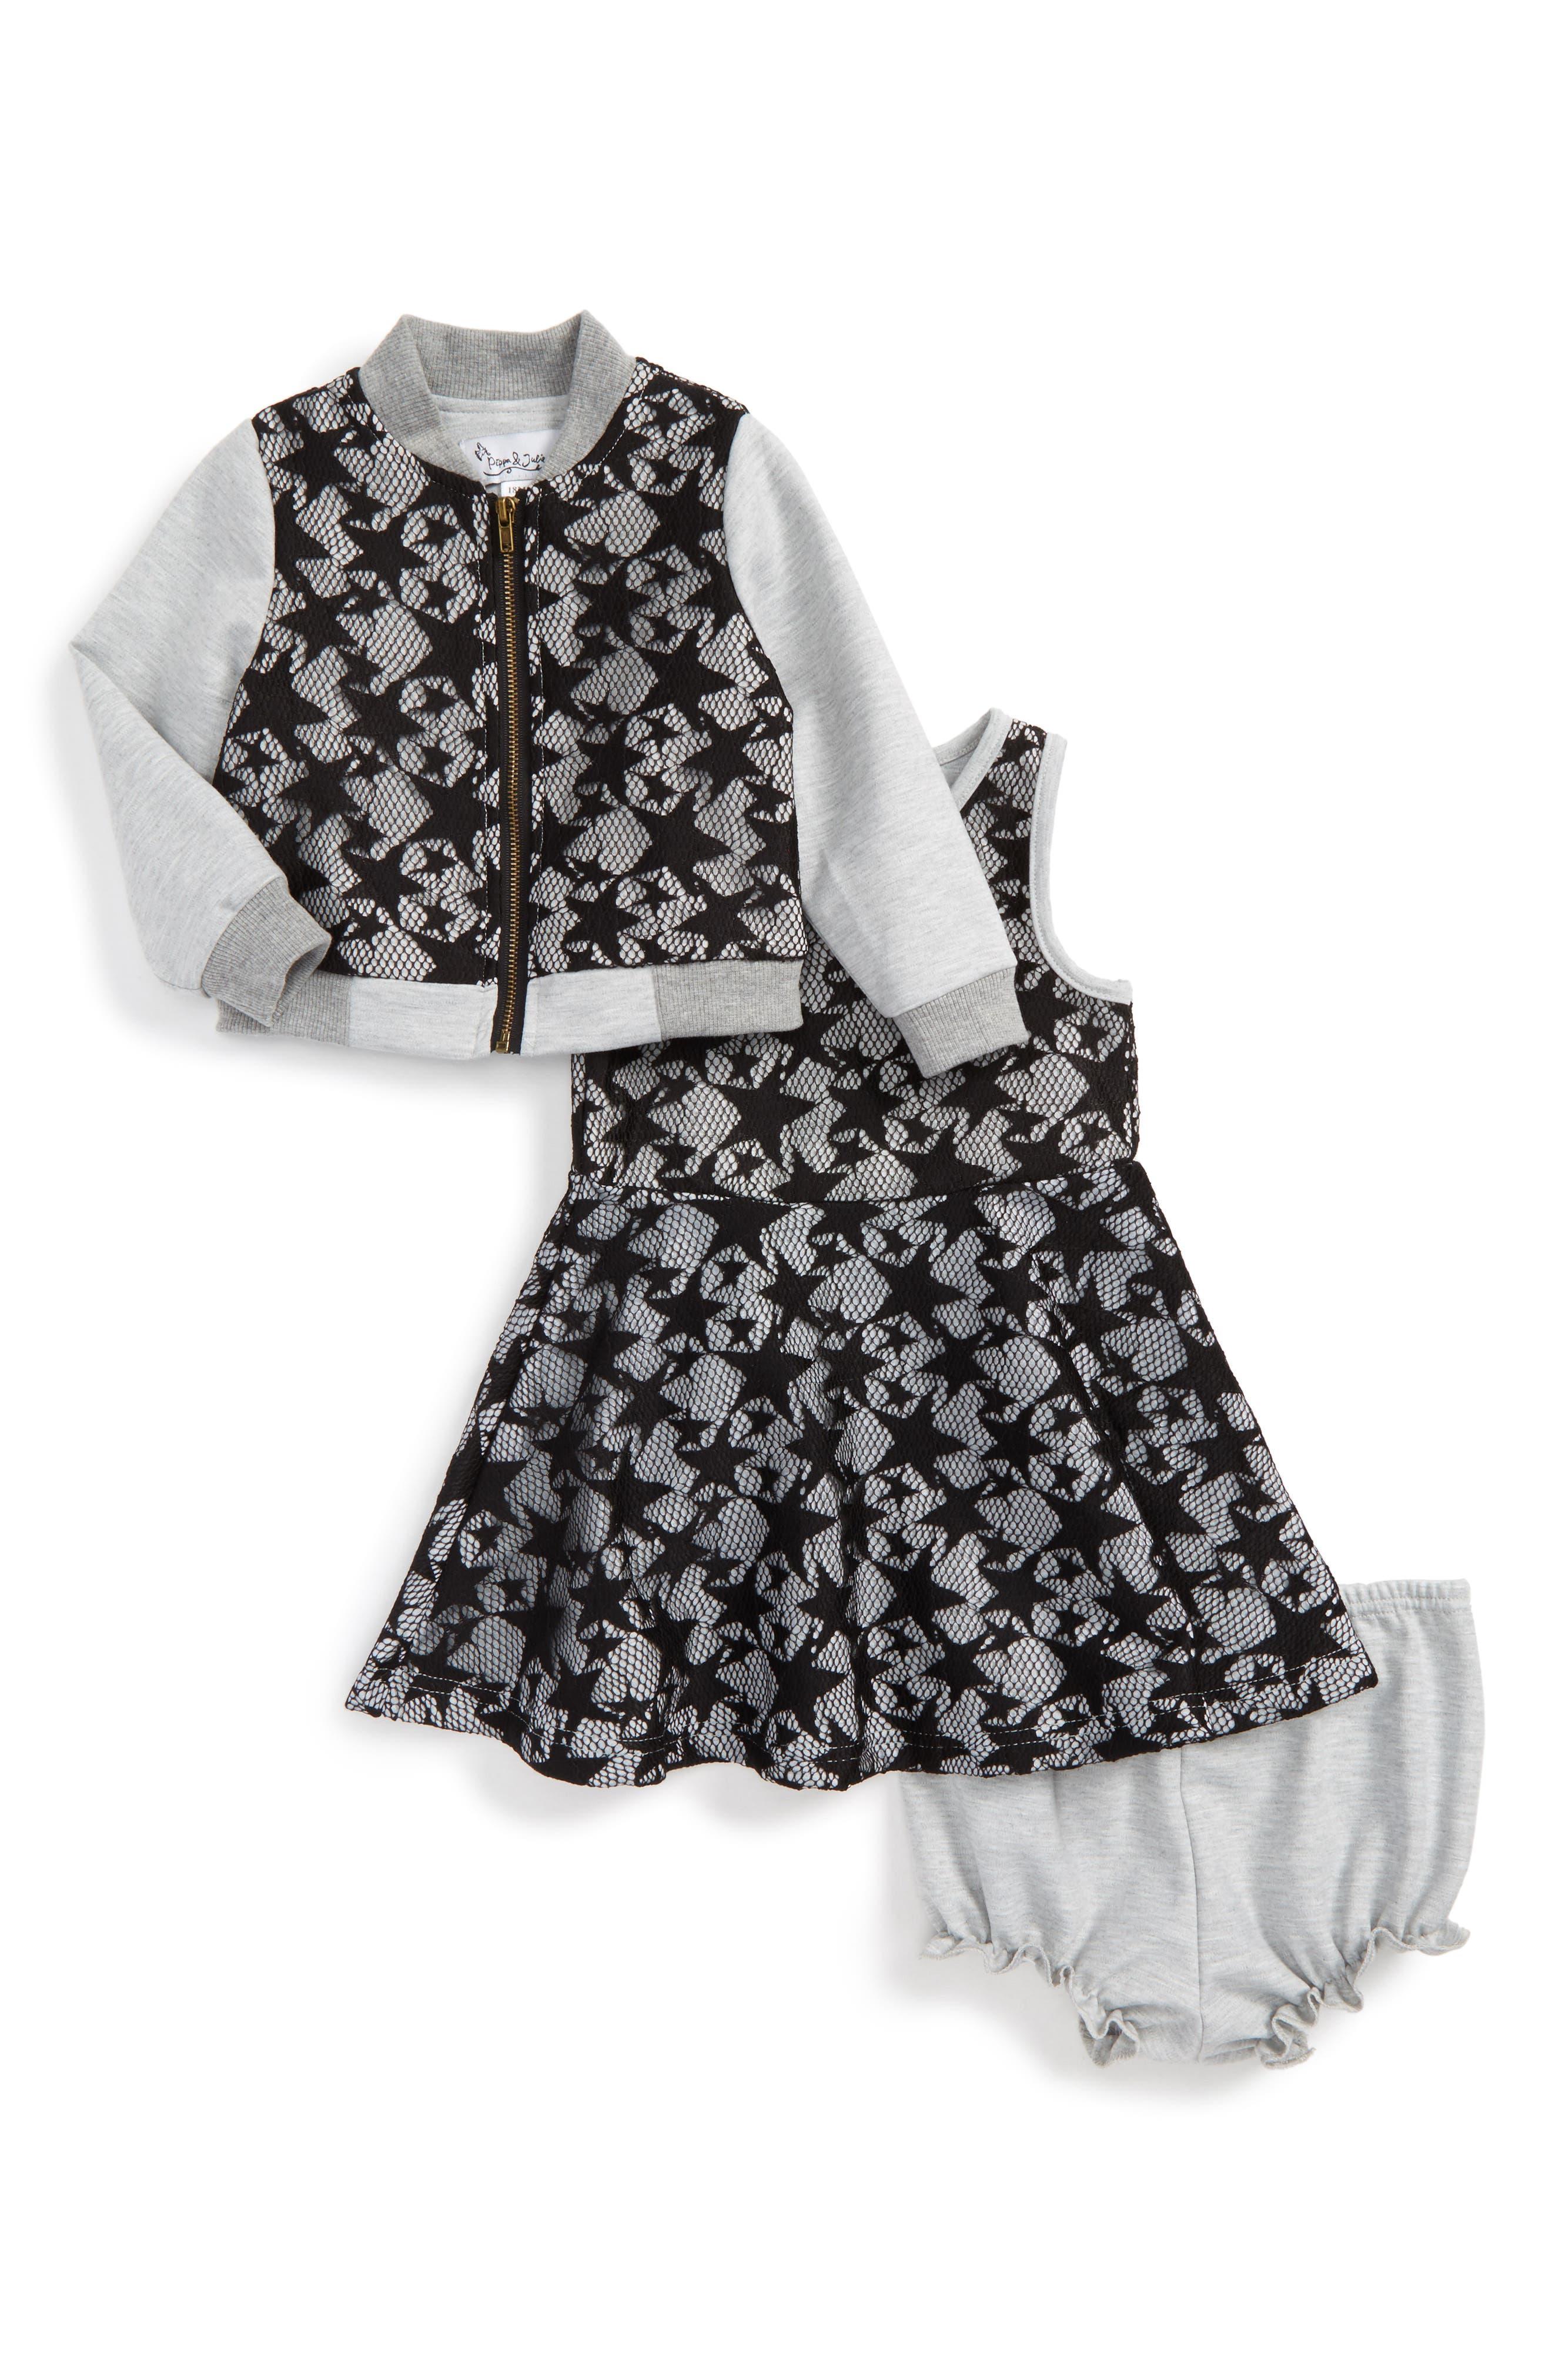 Main Image - Pippa & Julie Star Lace Jacket & Dress Set (Baby Girls)